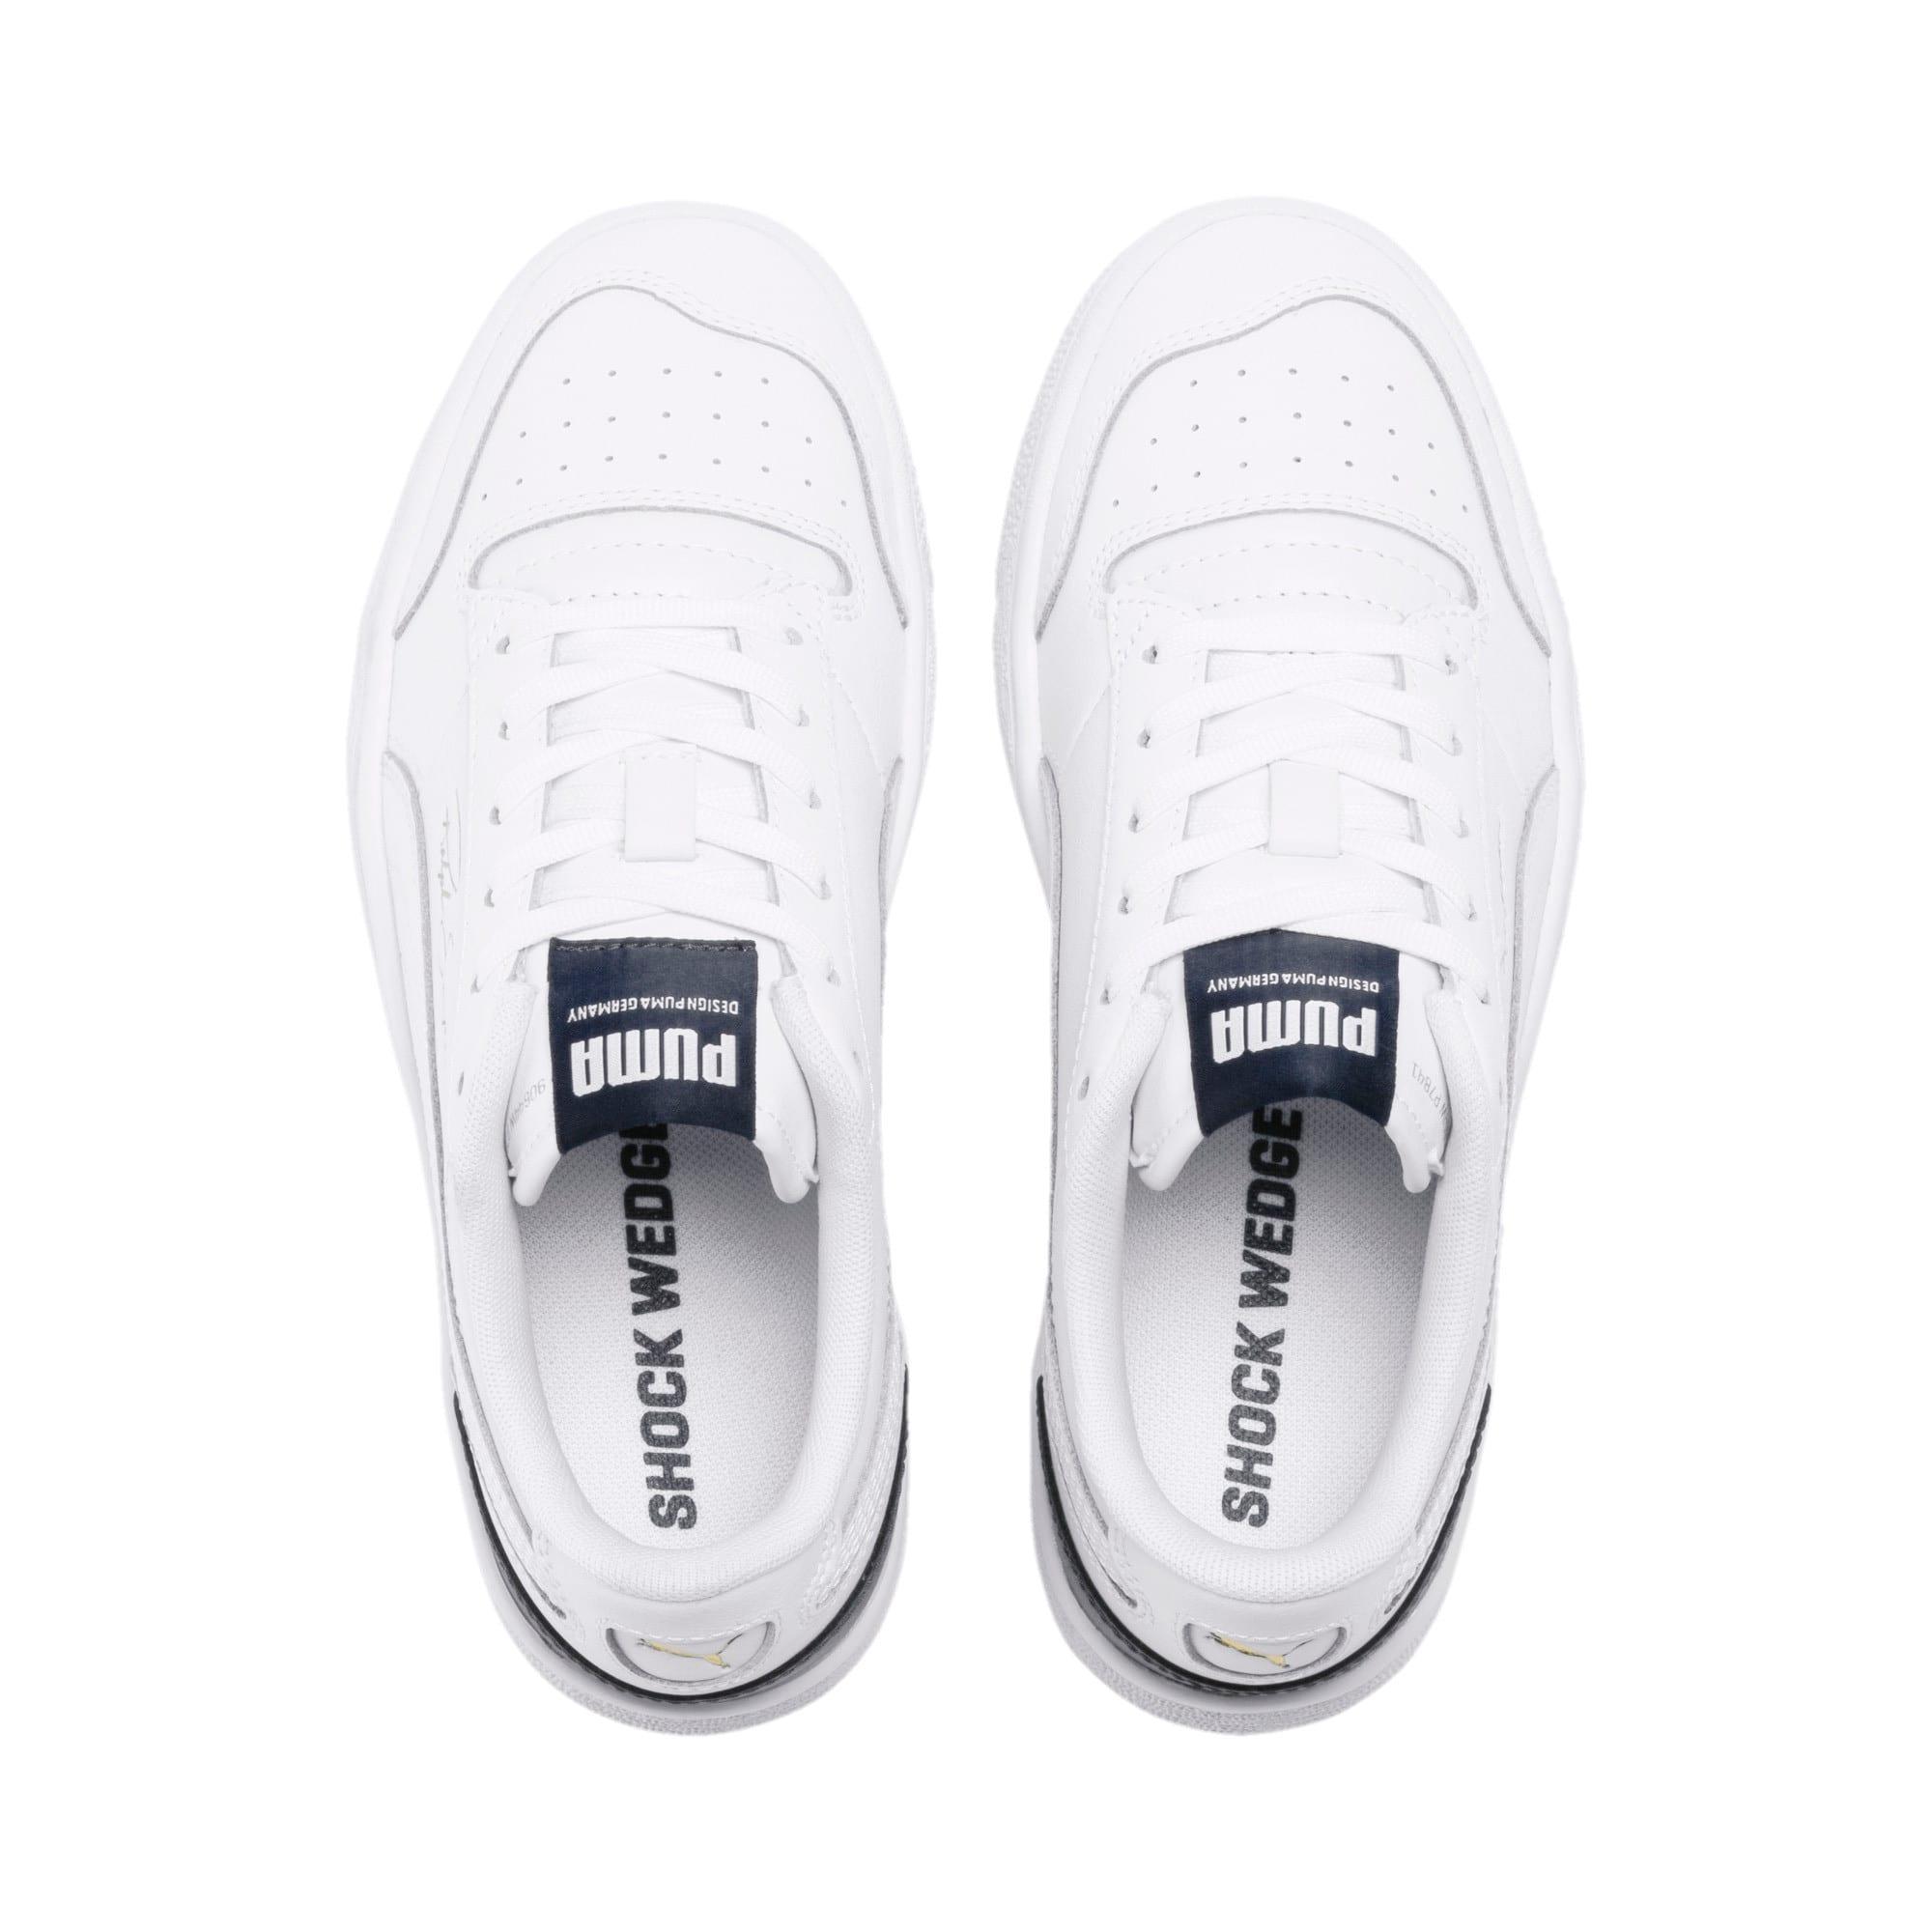 Thumbnail 6 of Ralph Sampson Lo Sneakers JR, White-Peacoat-White, medium